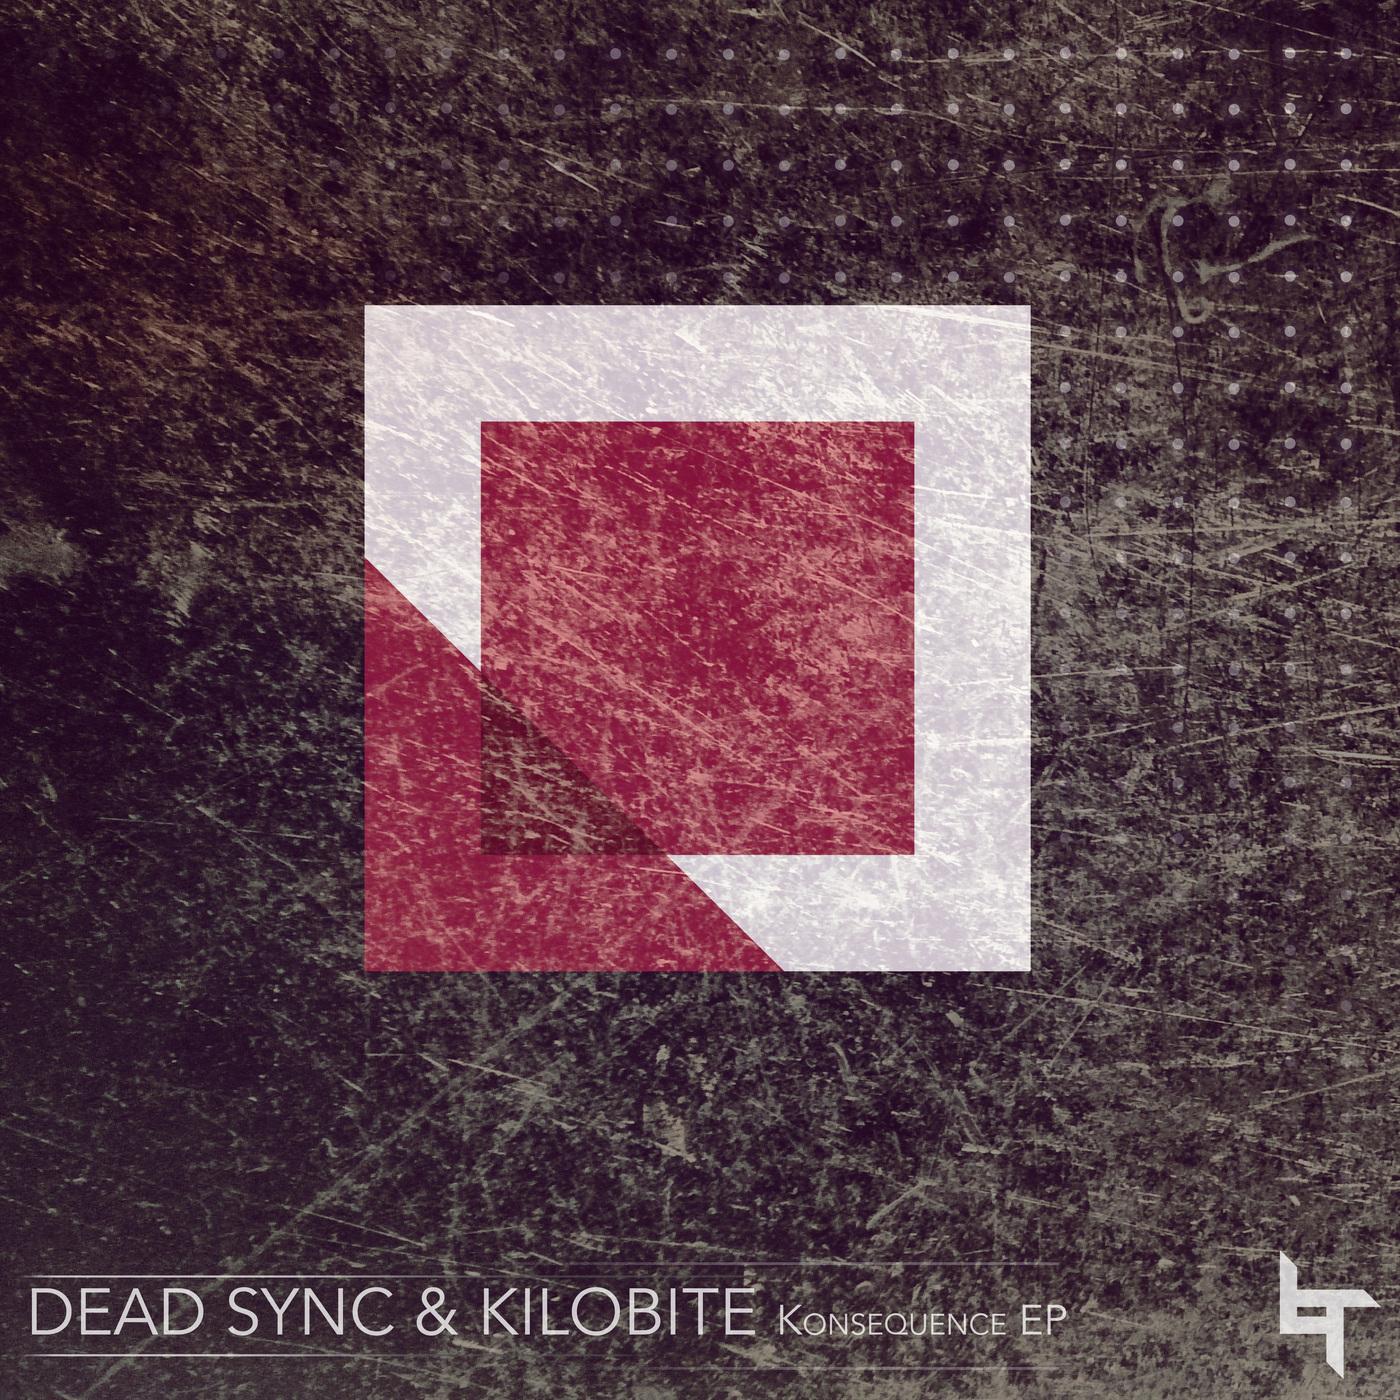 Dead Sync & Kilobite - Curfew (Original Mix)